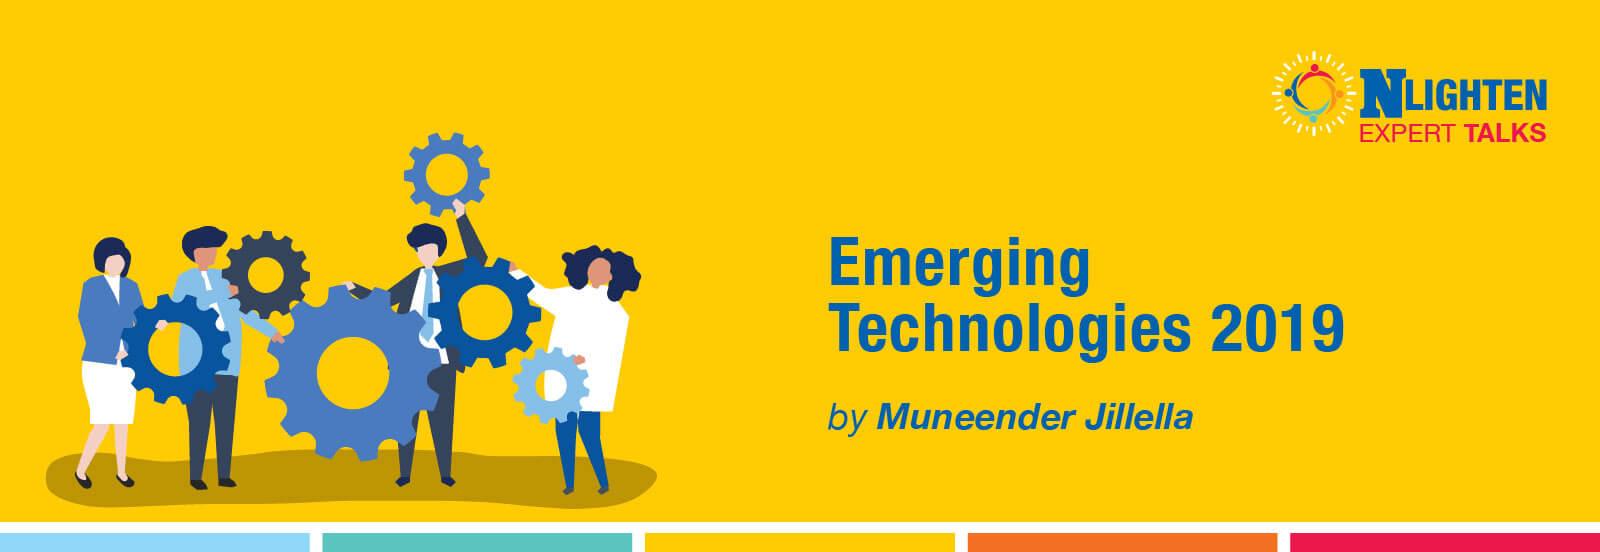 Emerging Technologies 2019